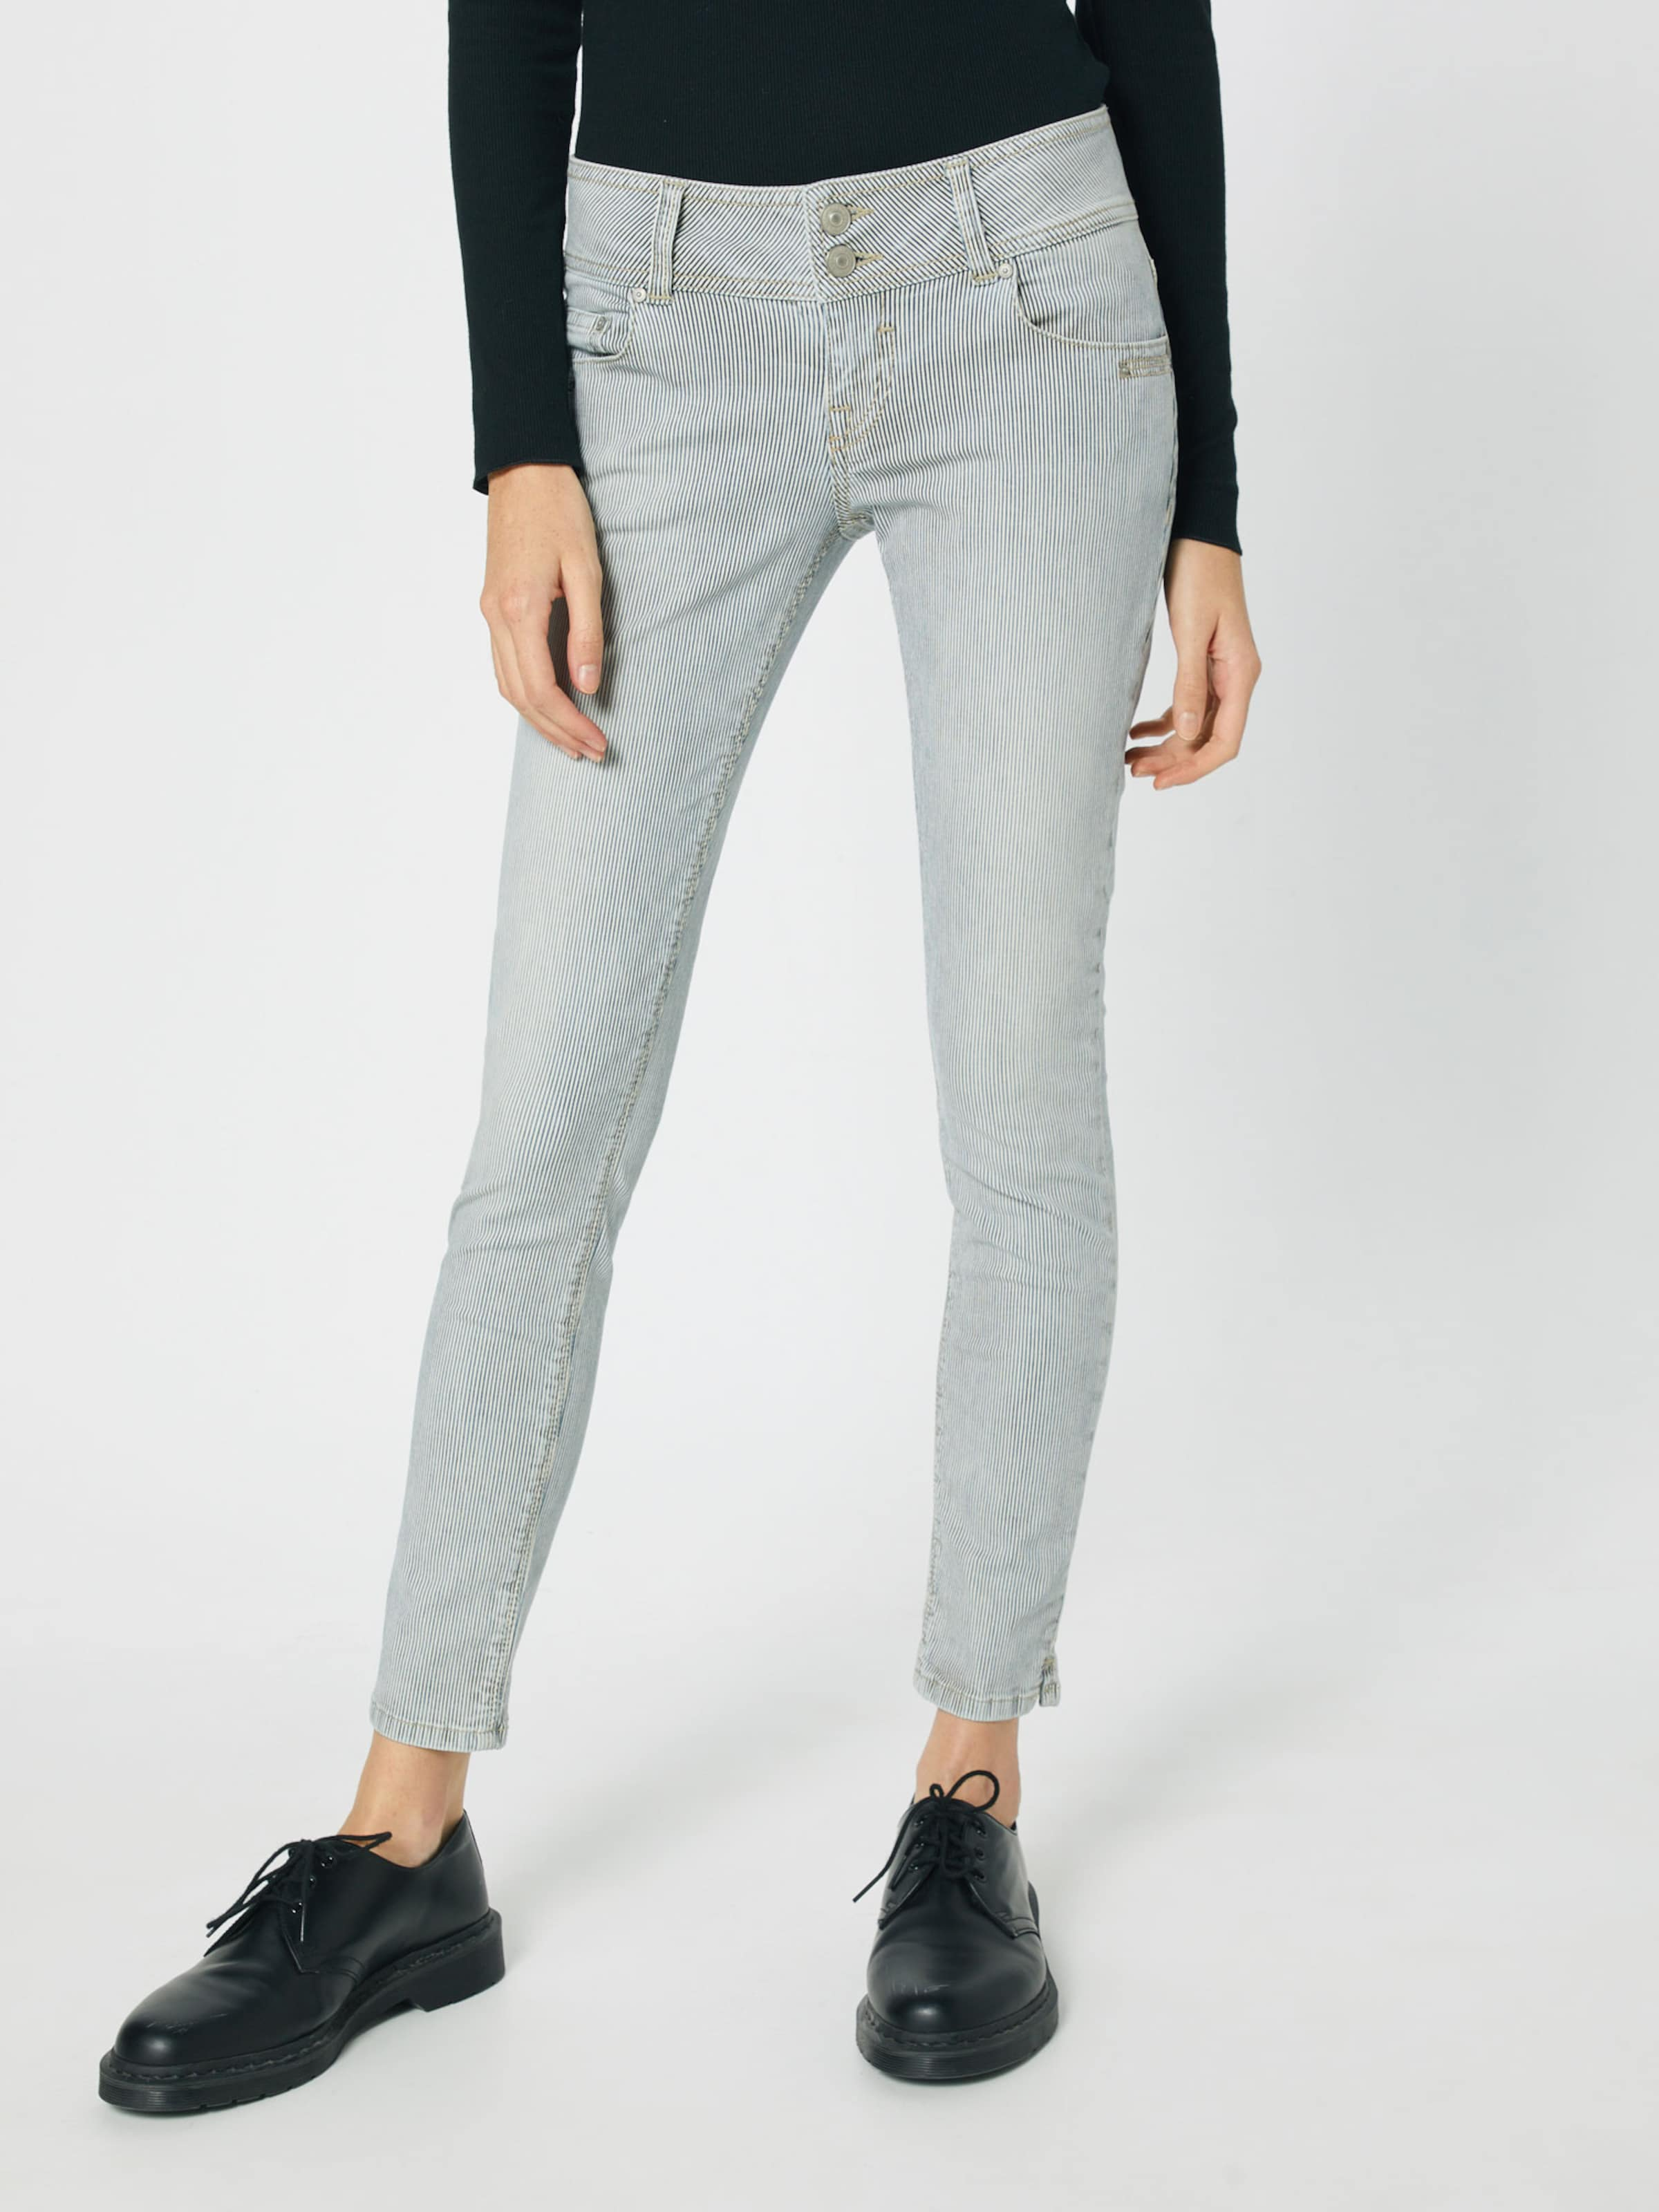 Ltb Ankle Skinny Denim 'georget' Grey In pSUzMVq